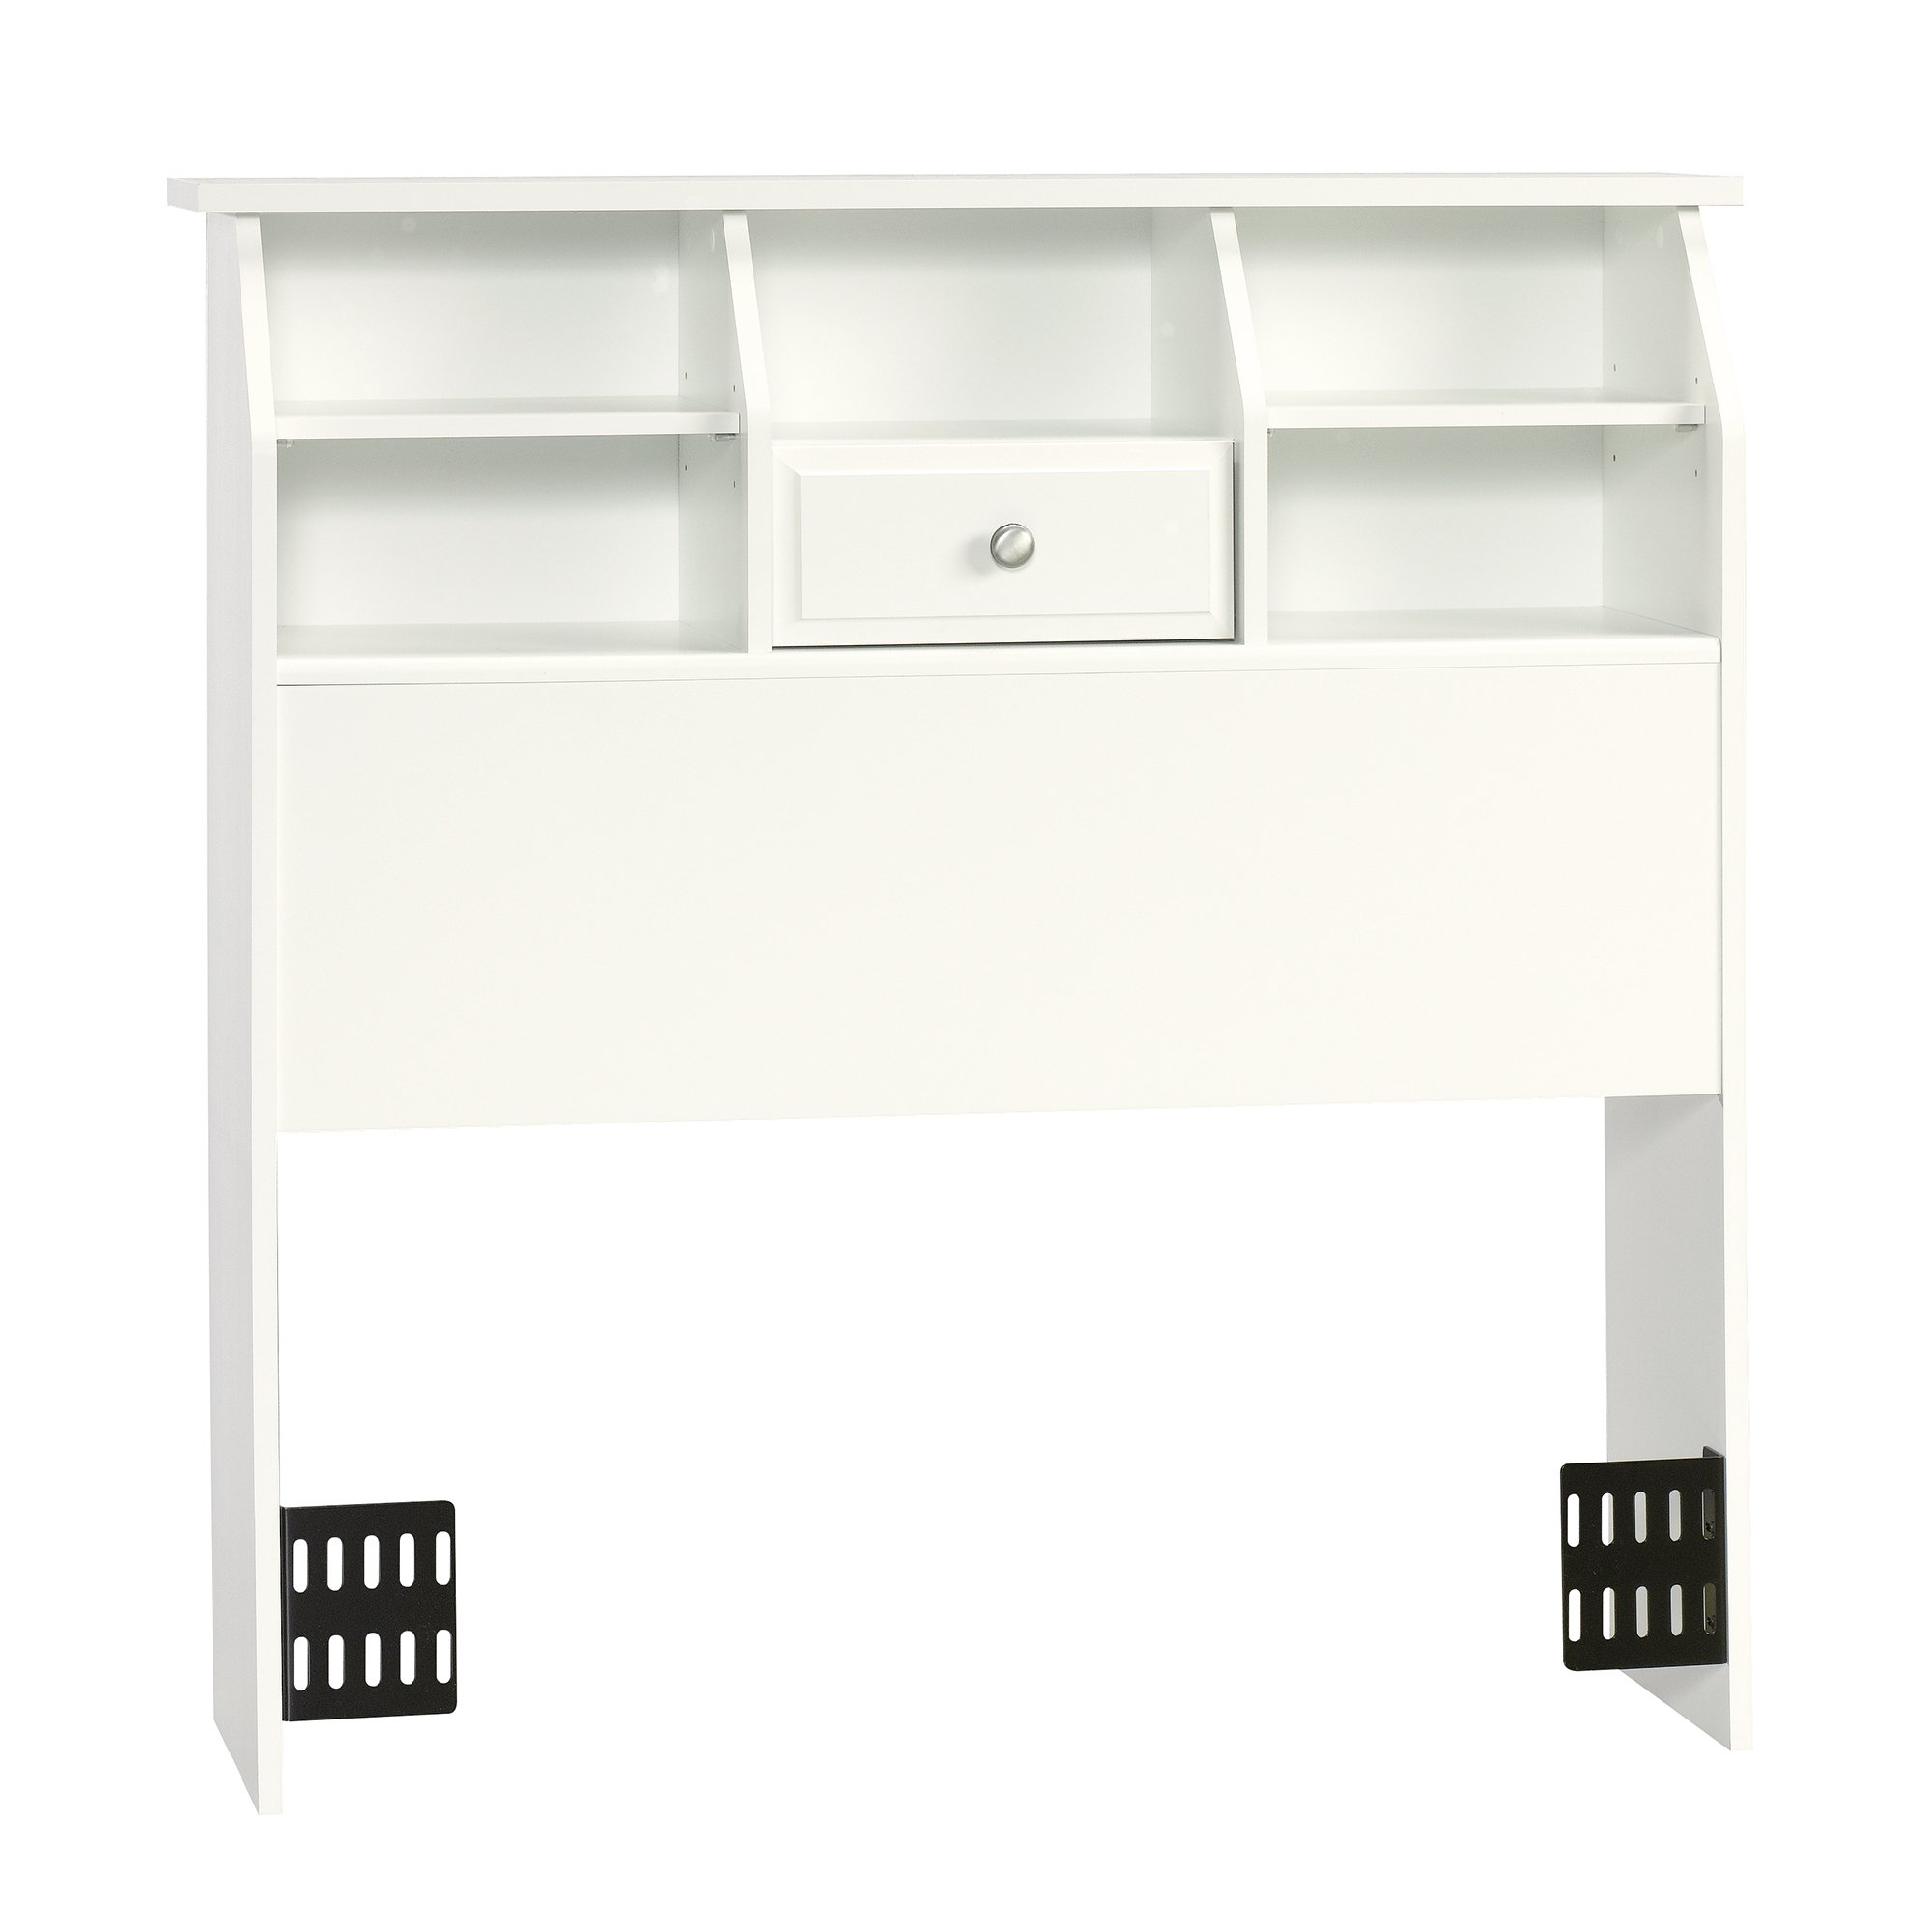 Sauder Shoal Creek Bookcase Headboard with Soft White Finish, Twin by Sauder